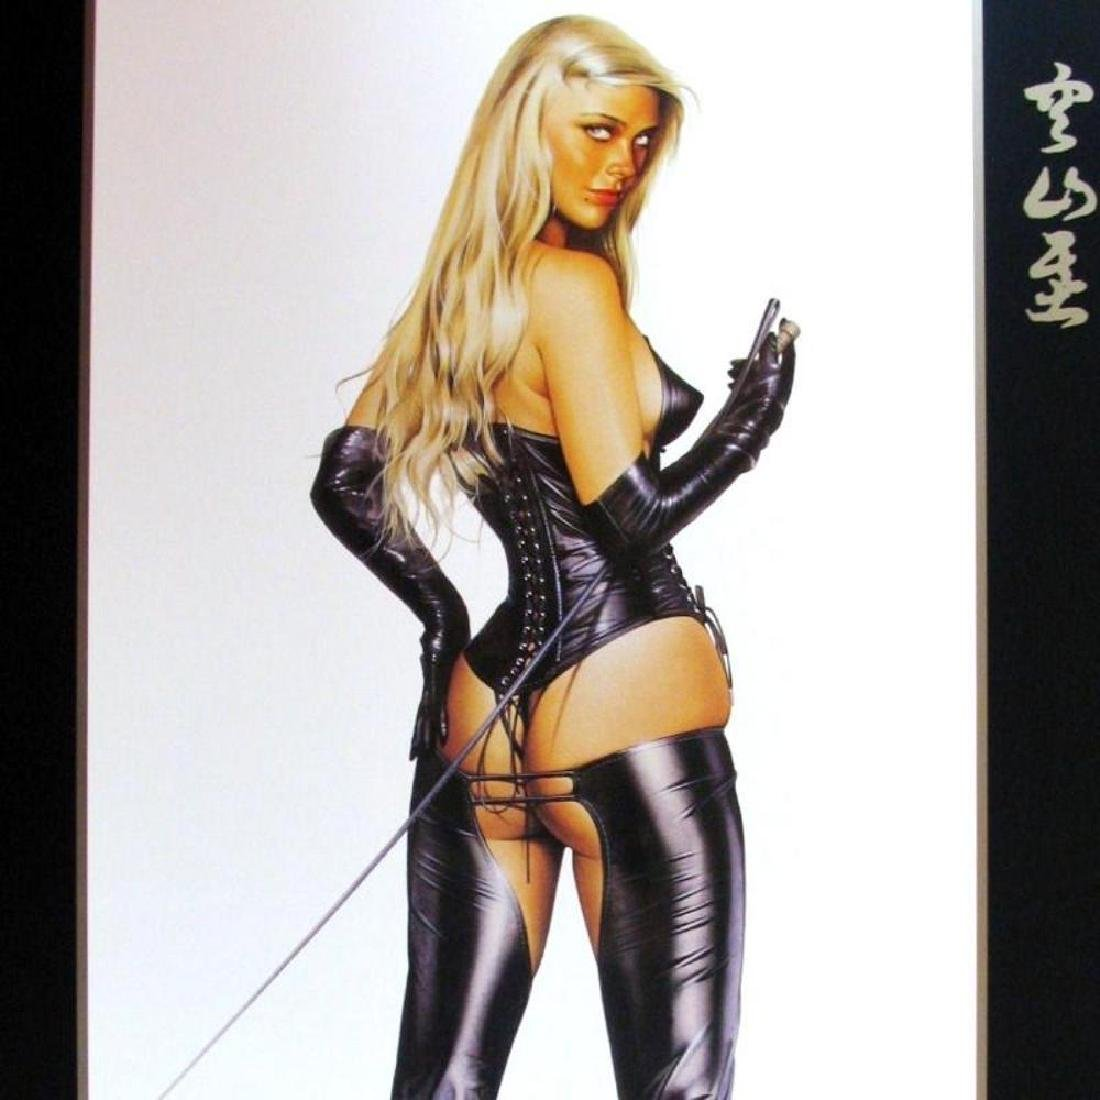 Sorayama Print Erotic Nude Black Leather Large - 3